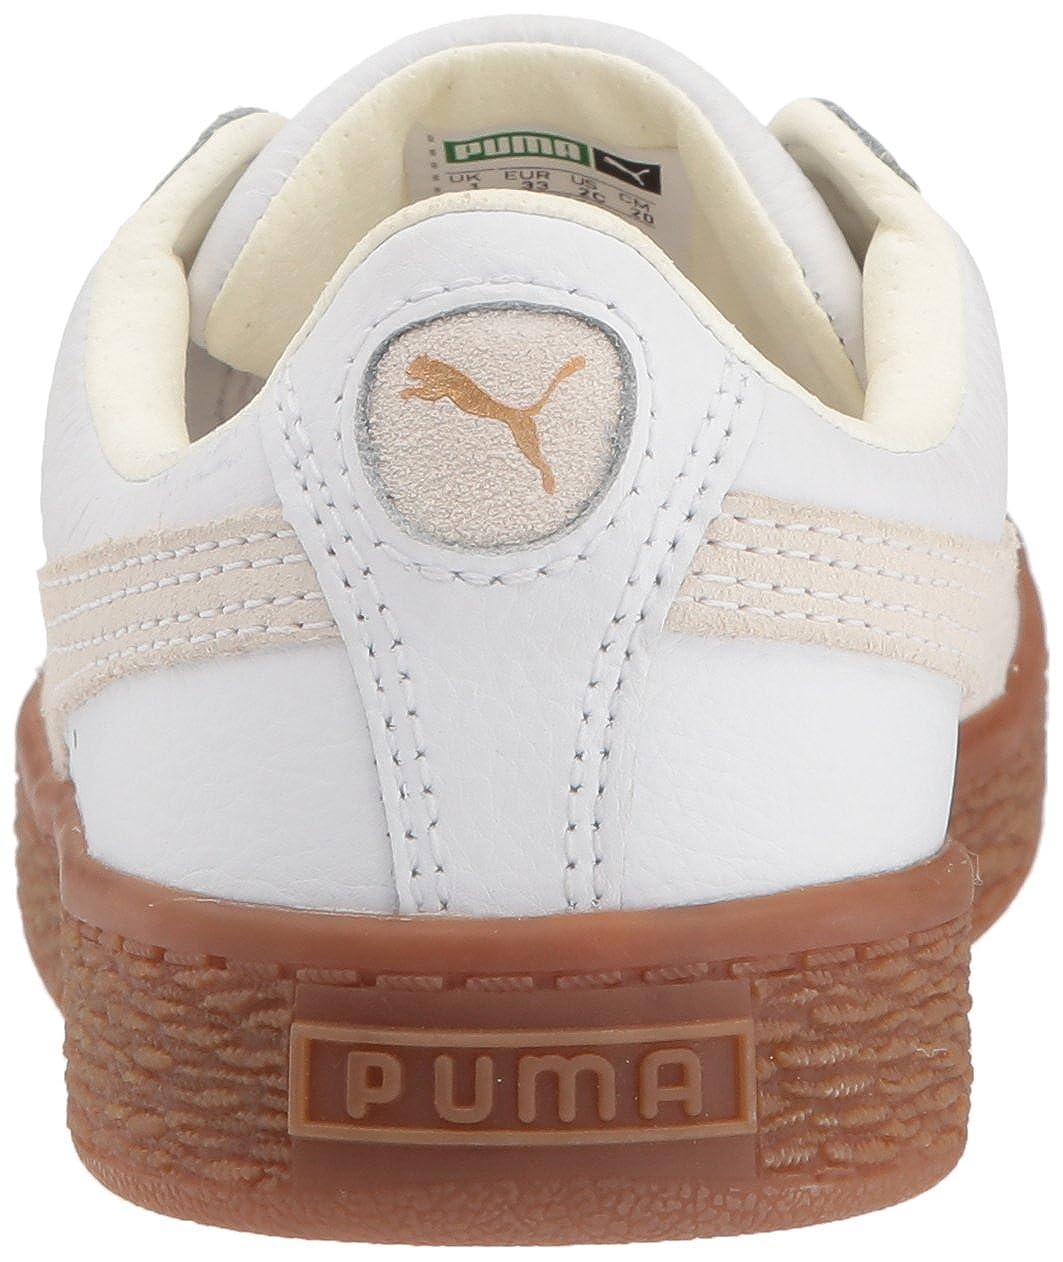 PUMA Kids Basket Classic Gum Deluxe Sneaker